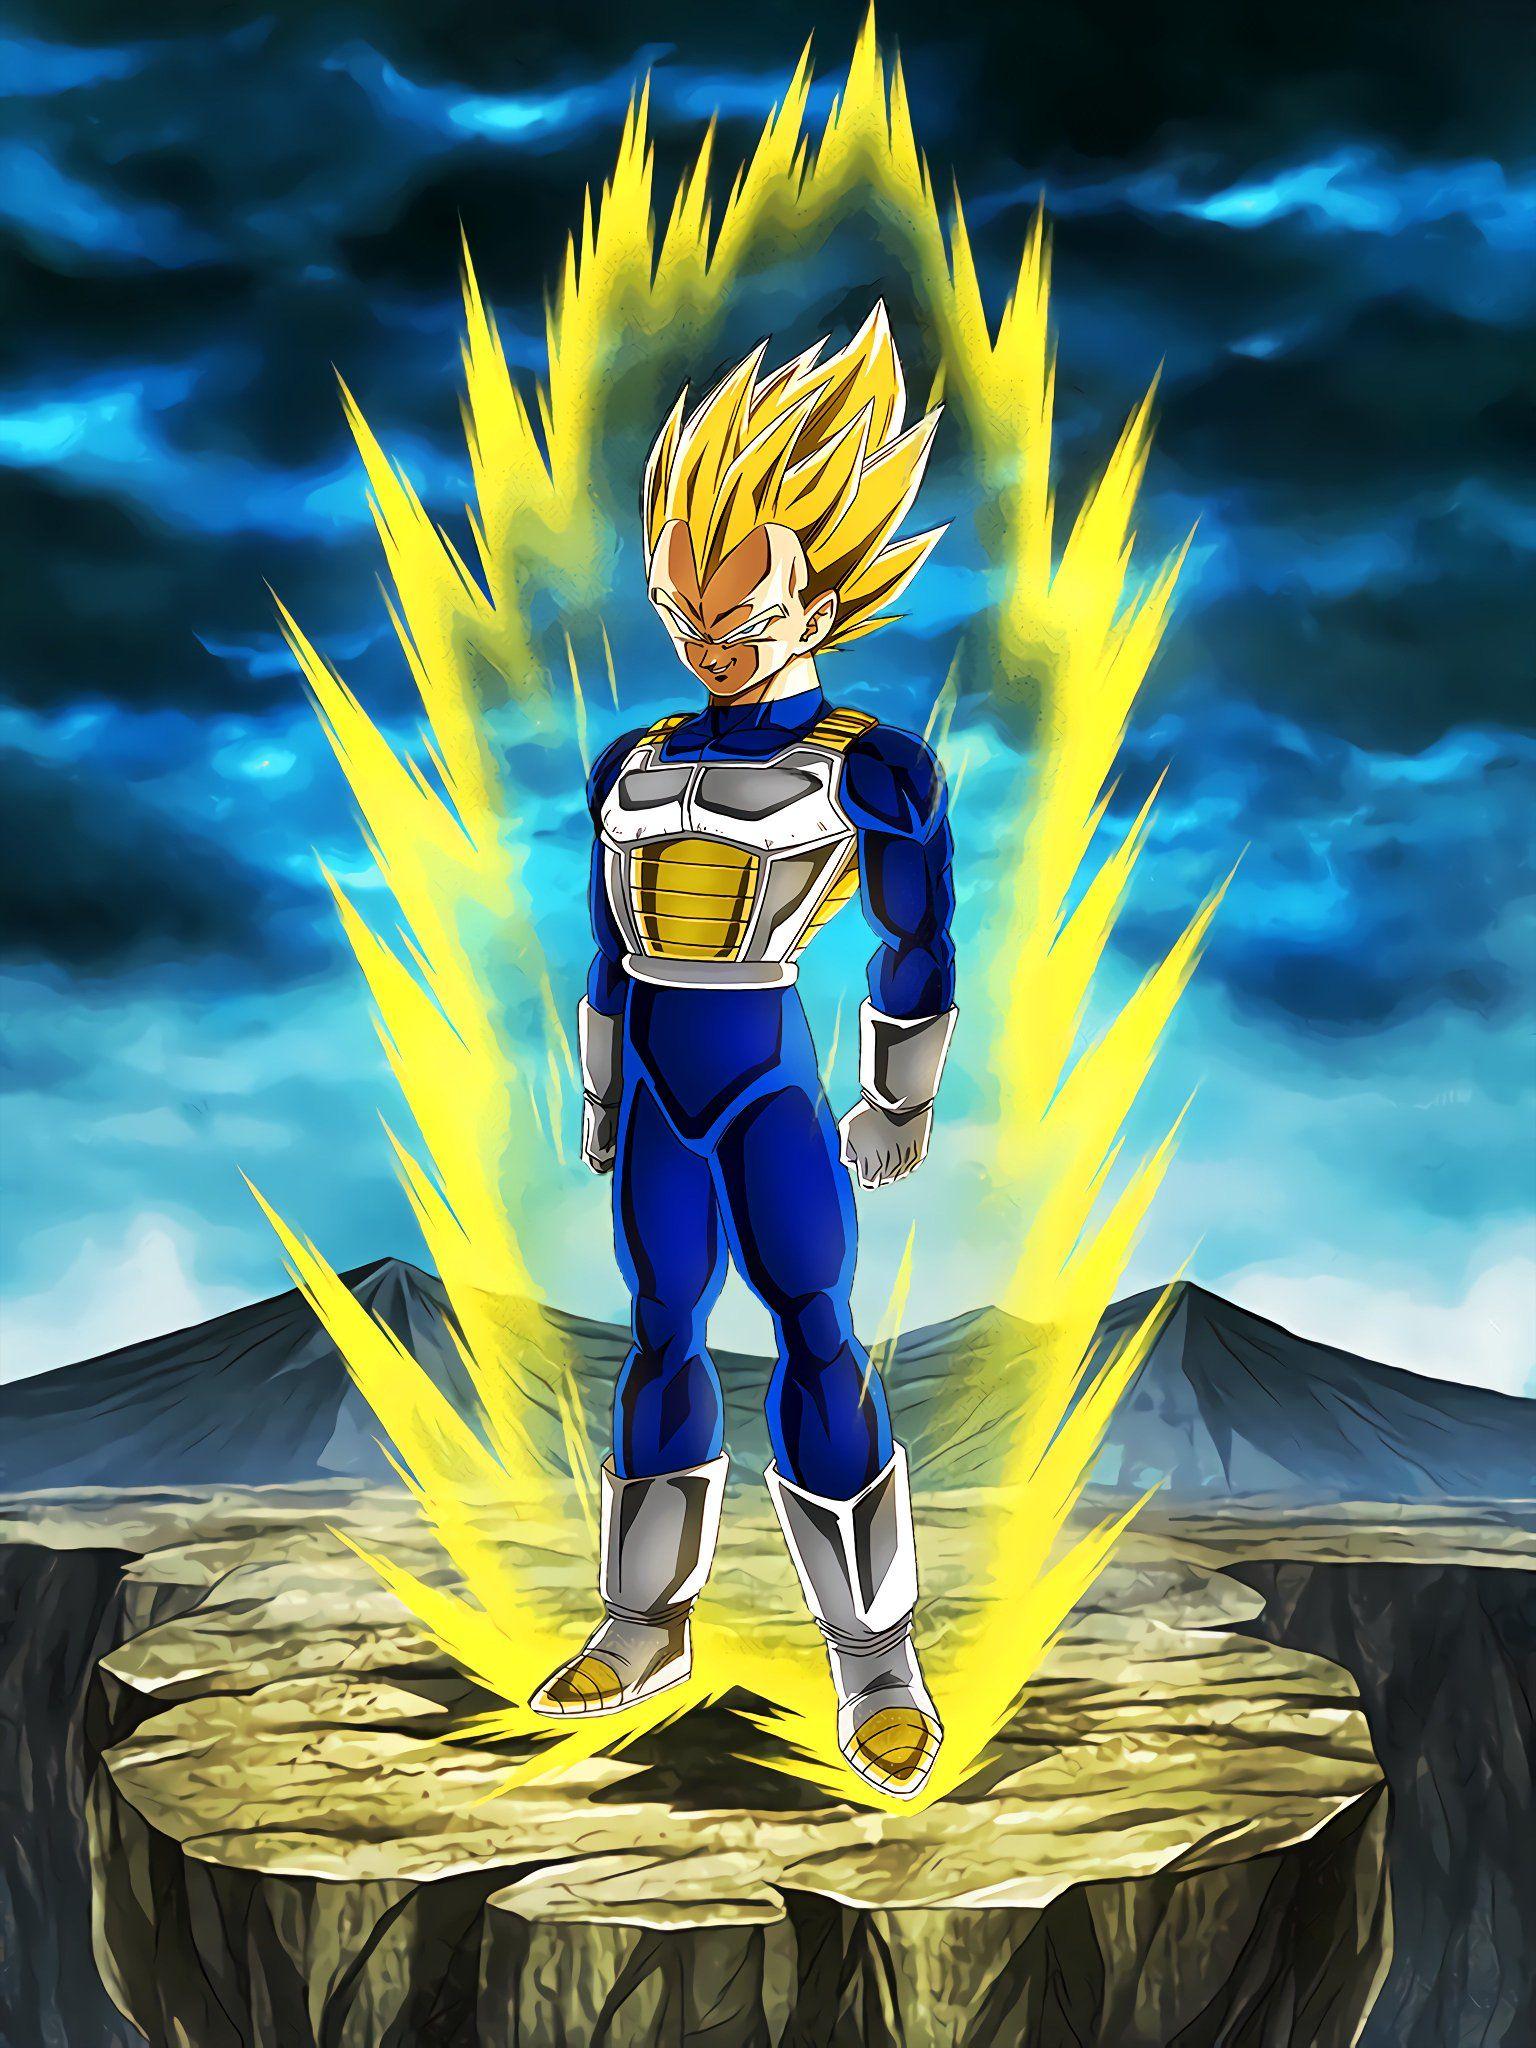 Hydros On Twitter Anime Dragon Ball Super Dragon Ball Super Goku Dragon Ball Super Manga